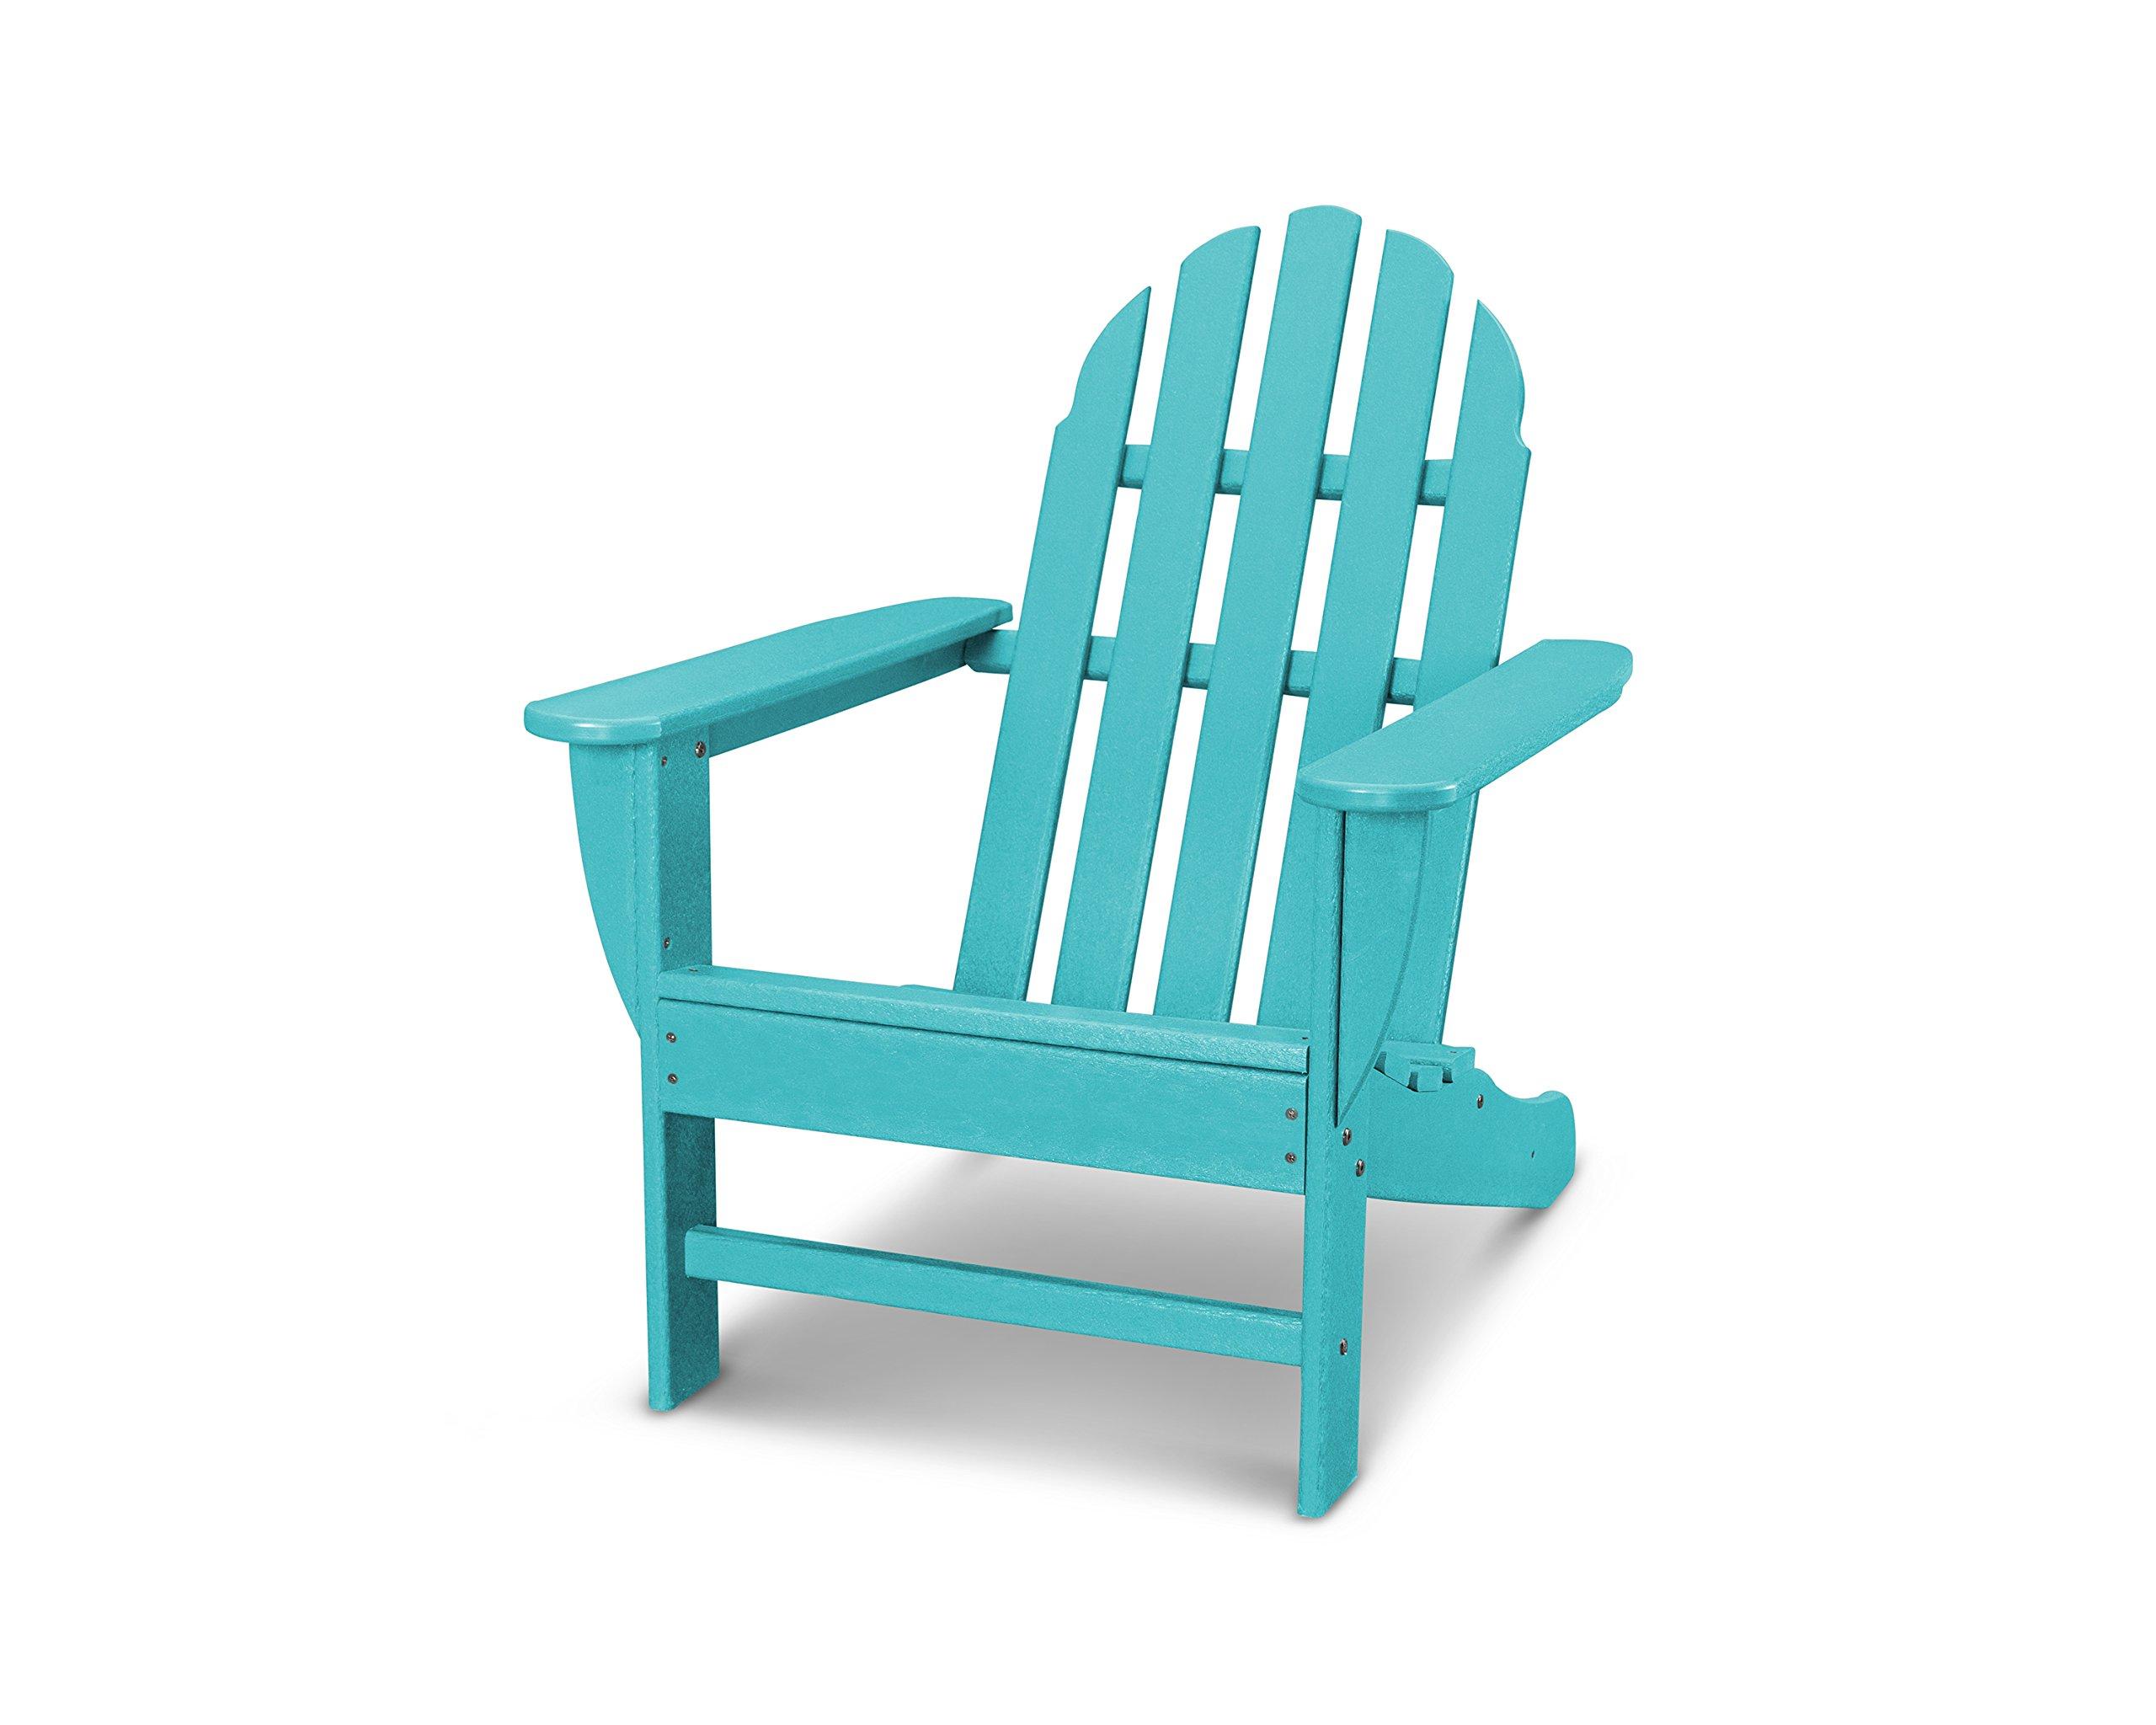 POLYWOOD AD4030AR Classic Outdoor Adirondack Chair, Aruba by POLYWOOD